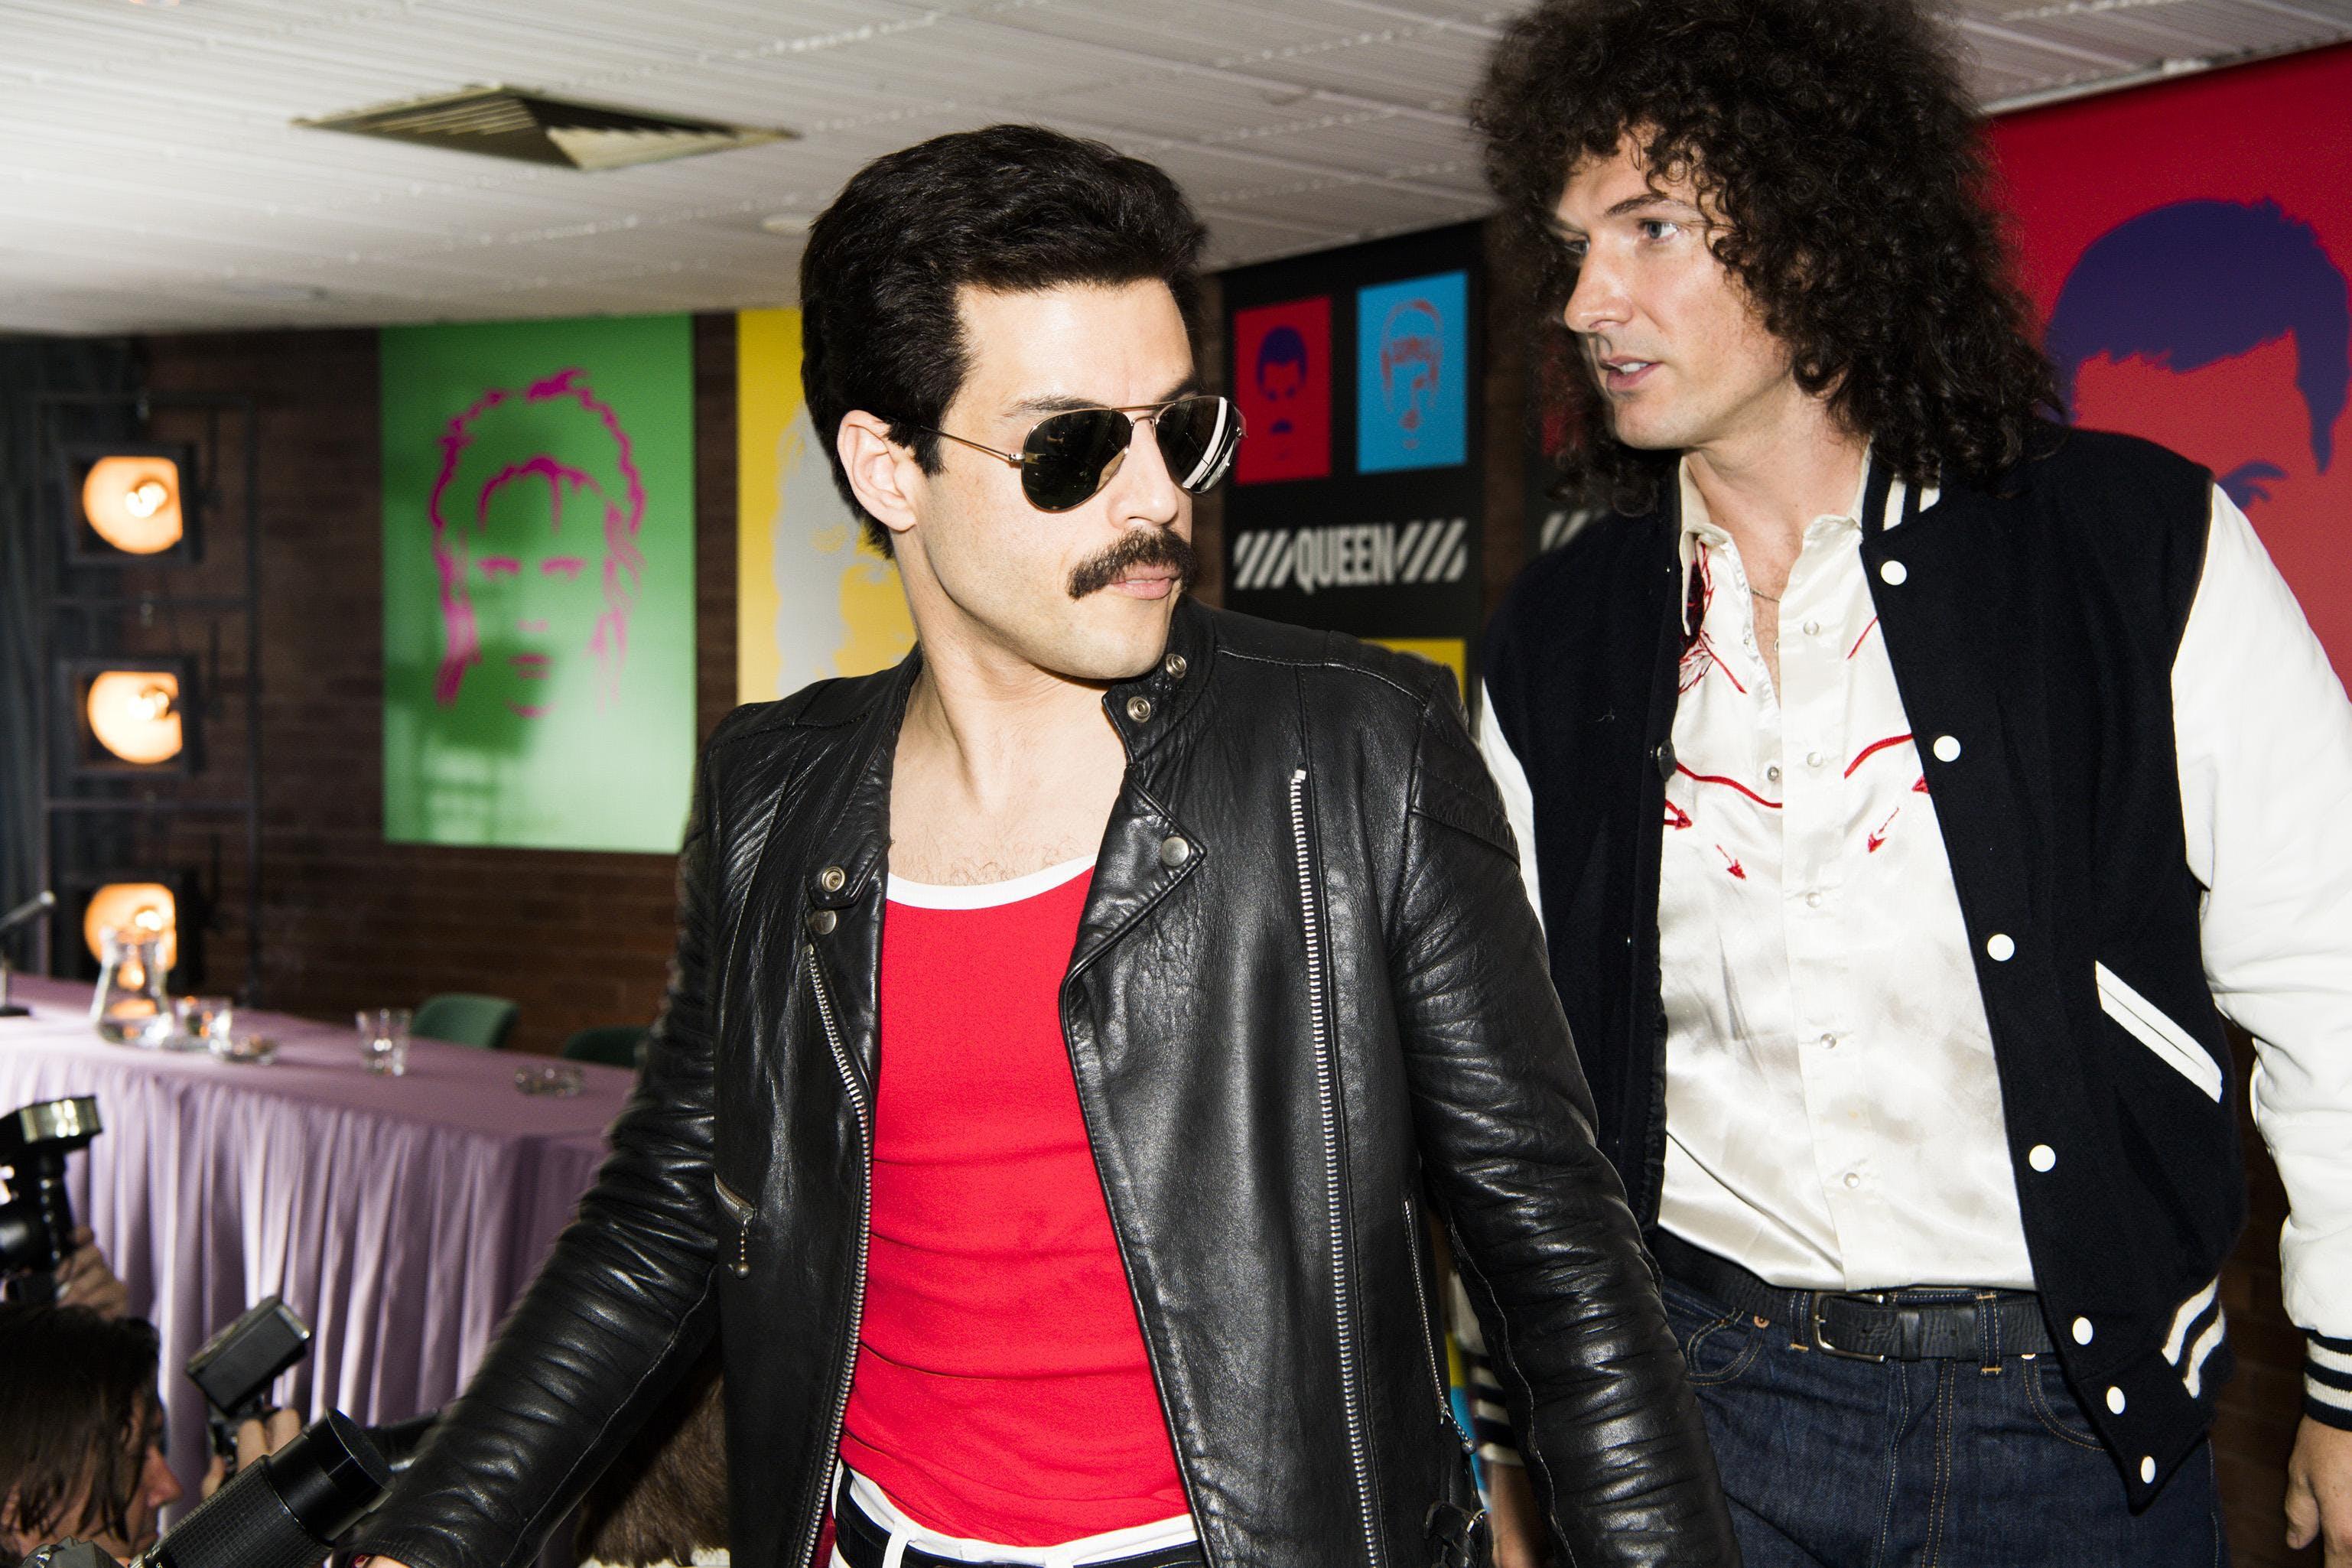 UCLA Free Movie: Bohemian Rhapsody - 30 OCT 2018 Evensi